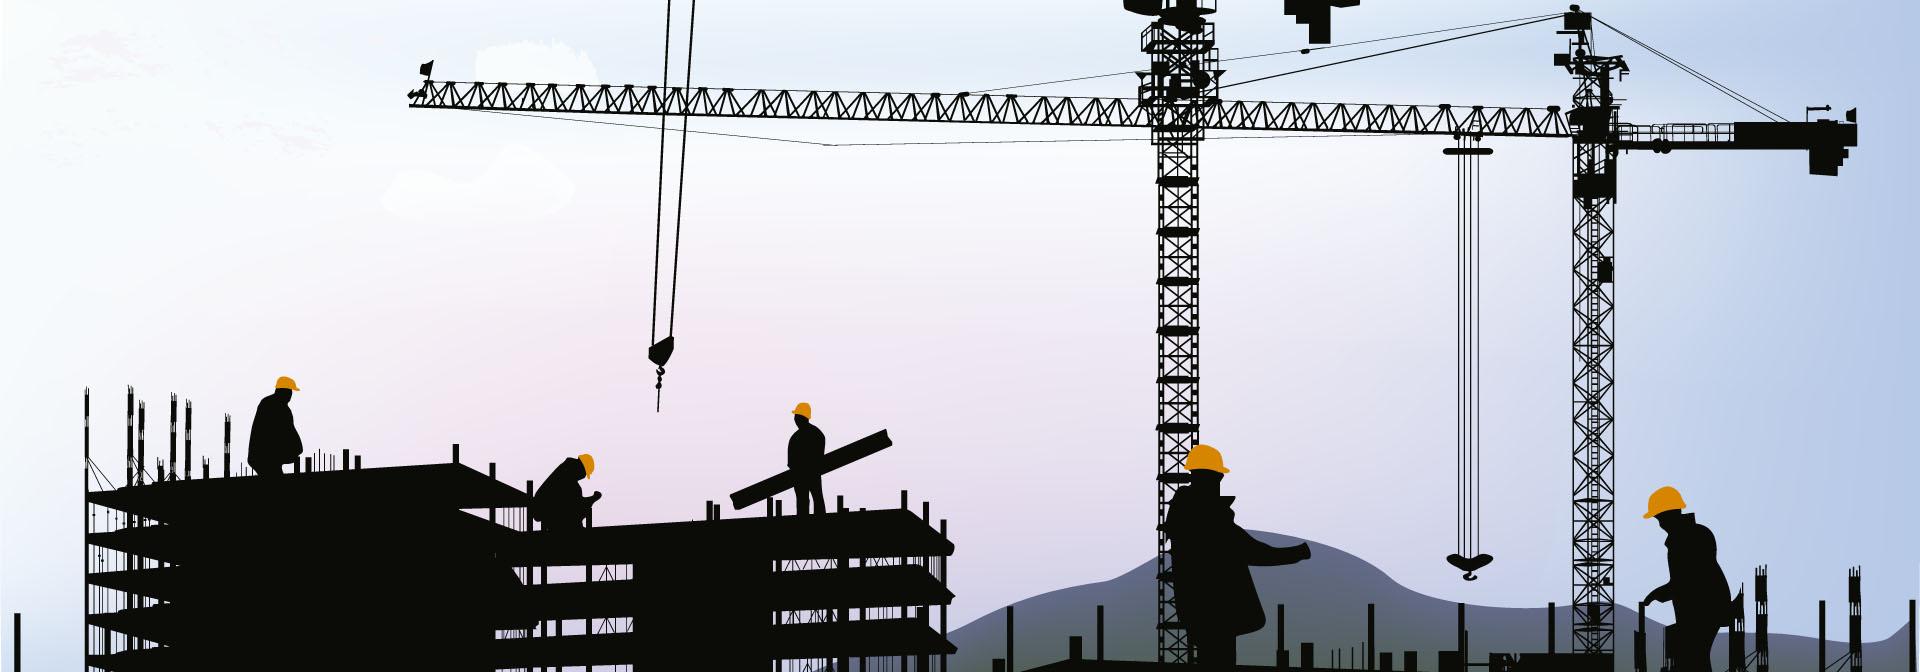 building-2hoisting crane-builder-sun-set-11-14-r